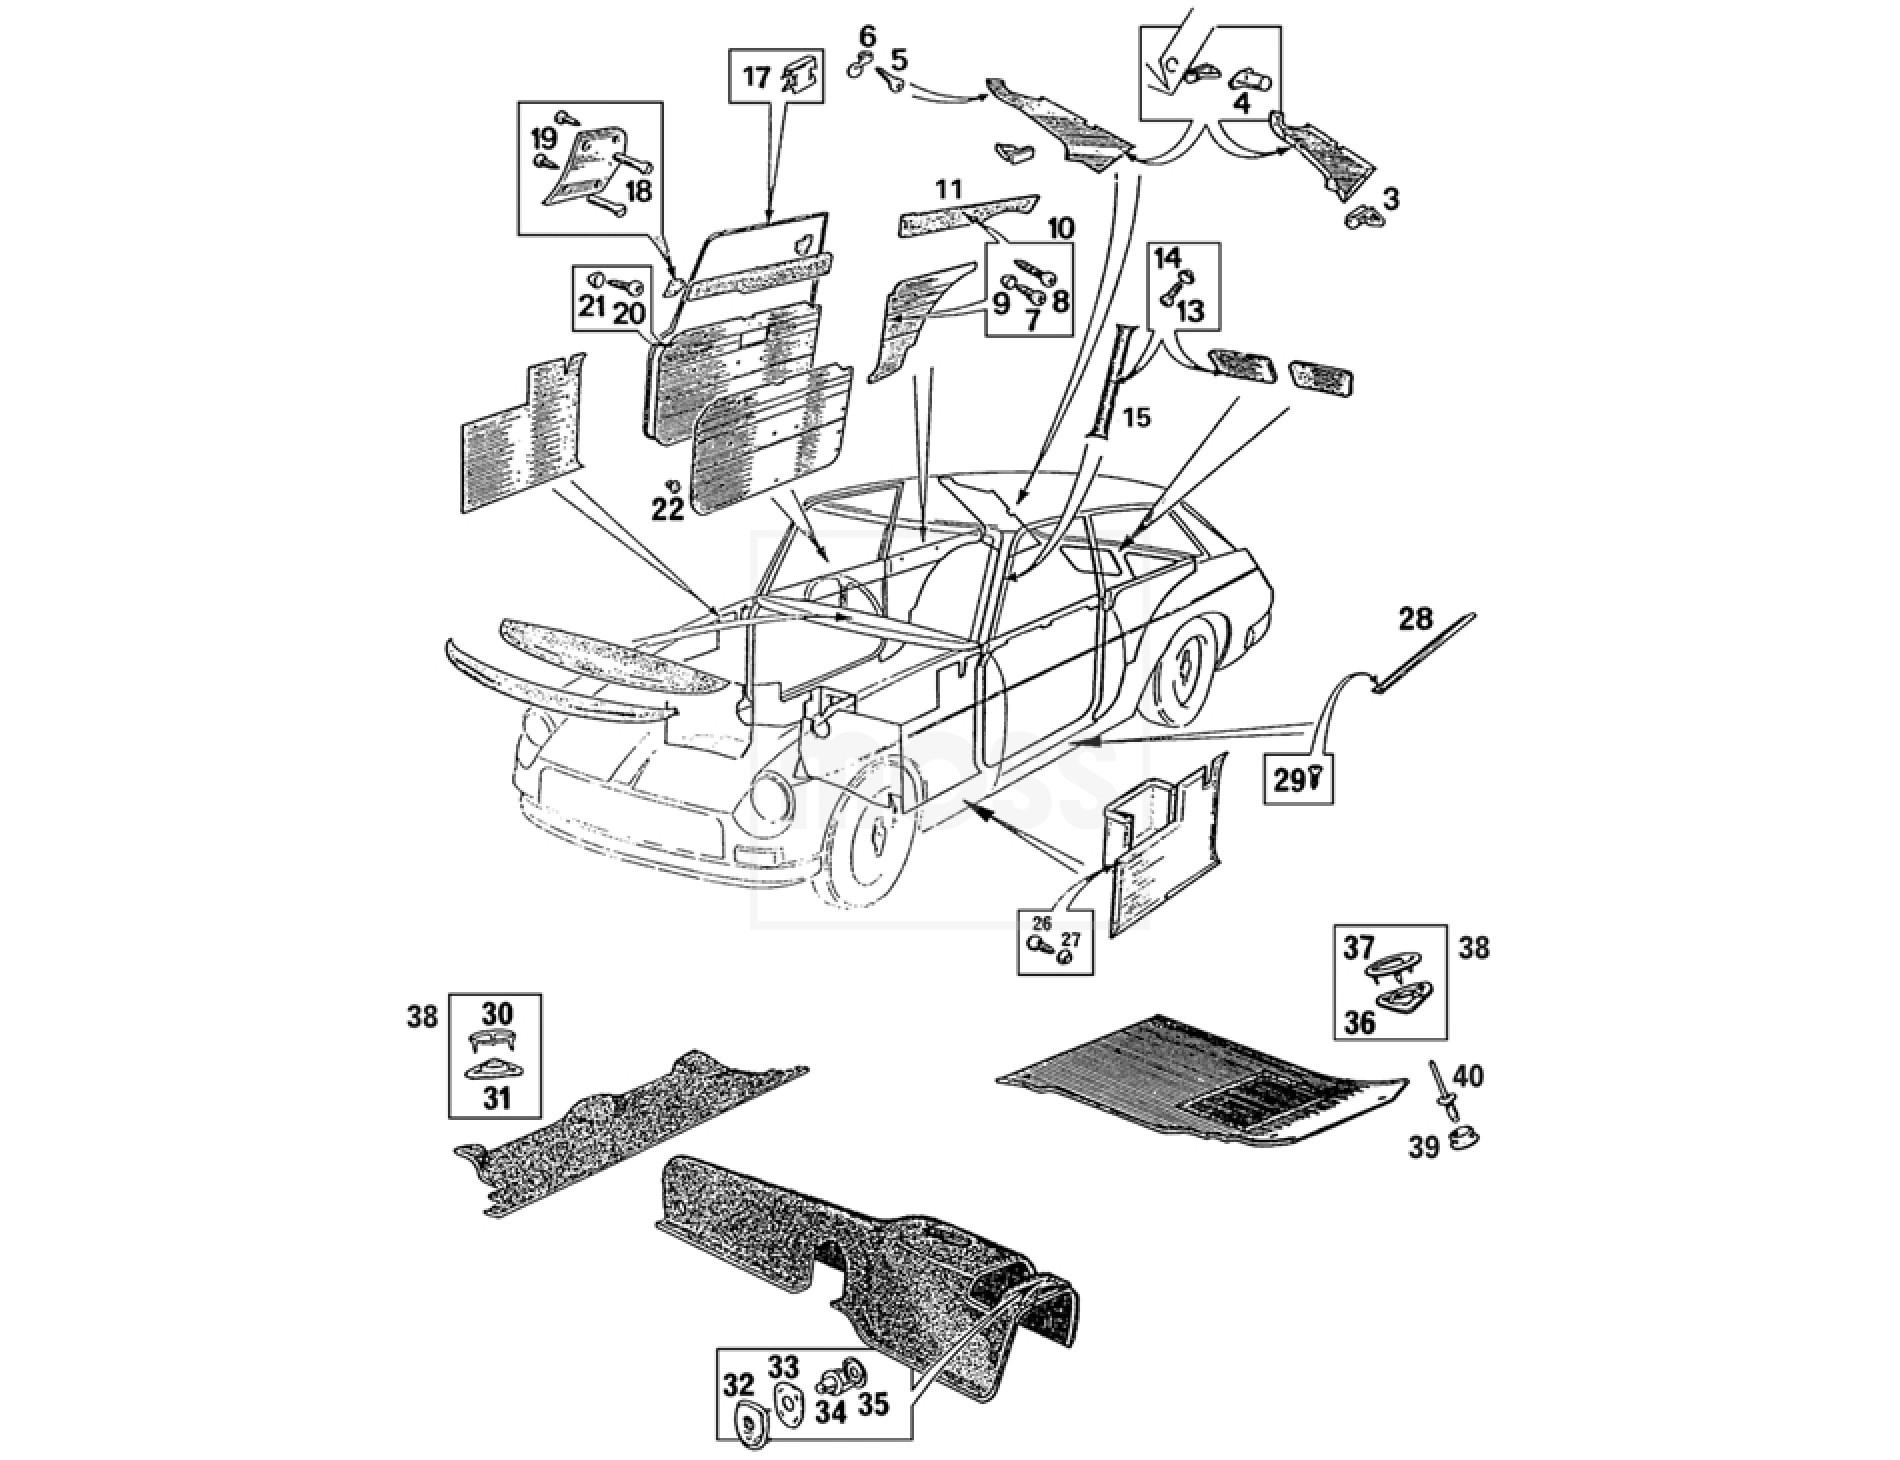 Bury Car Kit Wiring Diagram. Car Door Lock Diagram, Car ... Netax Single Door Wiring Diagram Union Select Unhex Hex Version X on